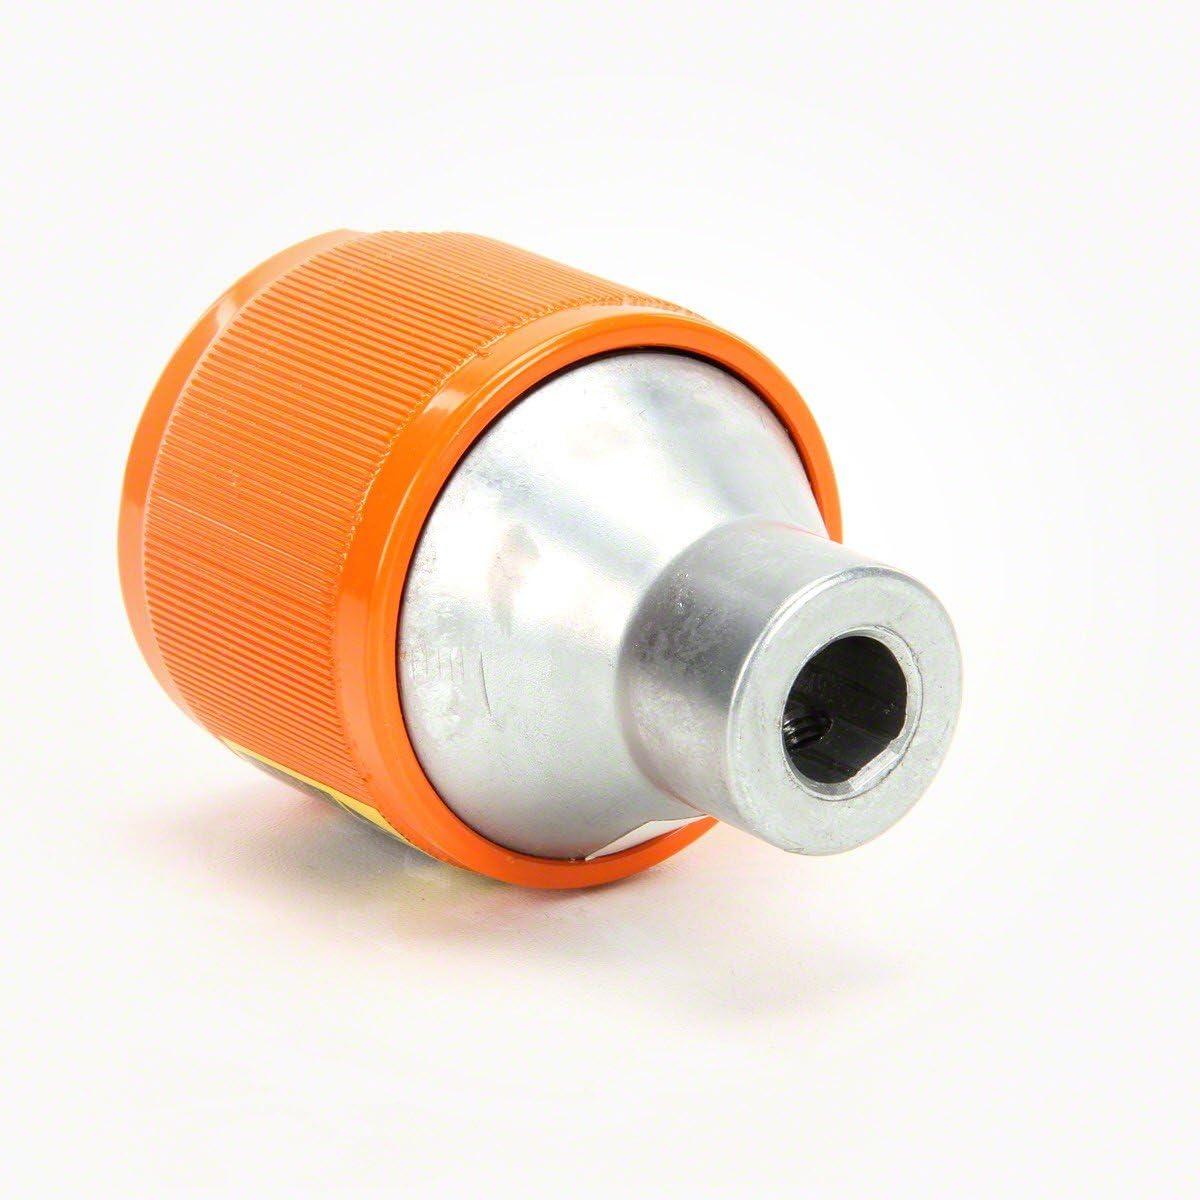 Limited time cheap Recommendation sale HyPro 1321-0006 Q-Coupler